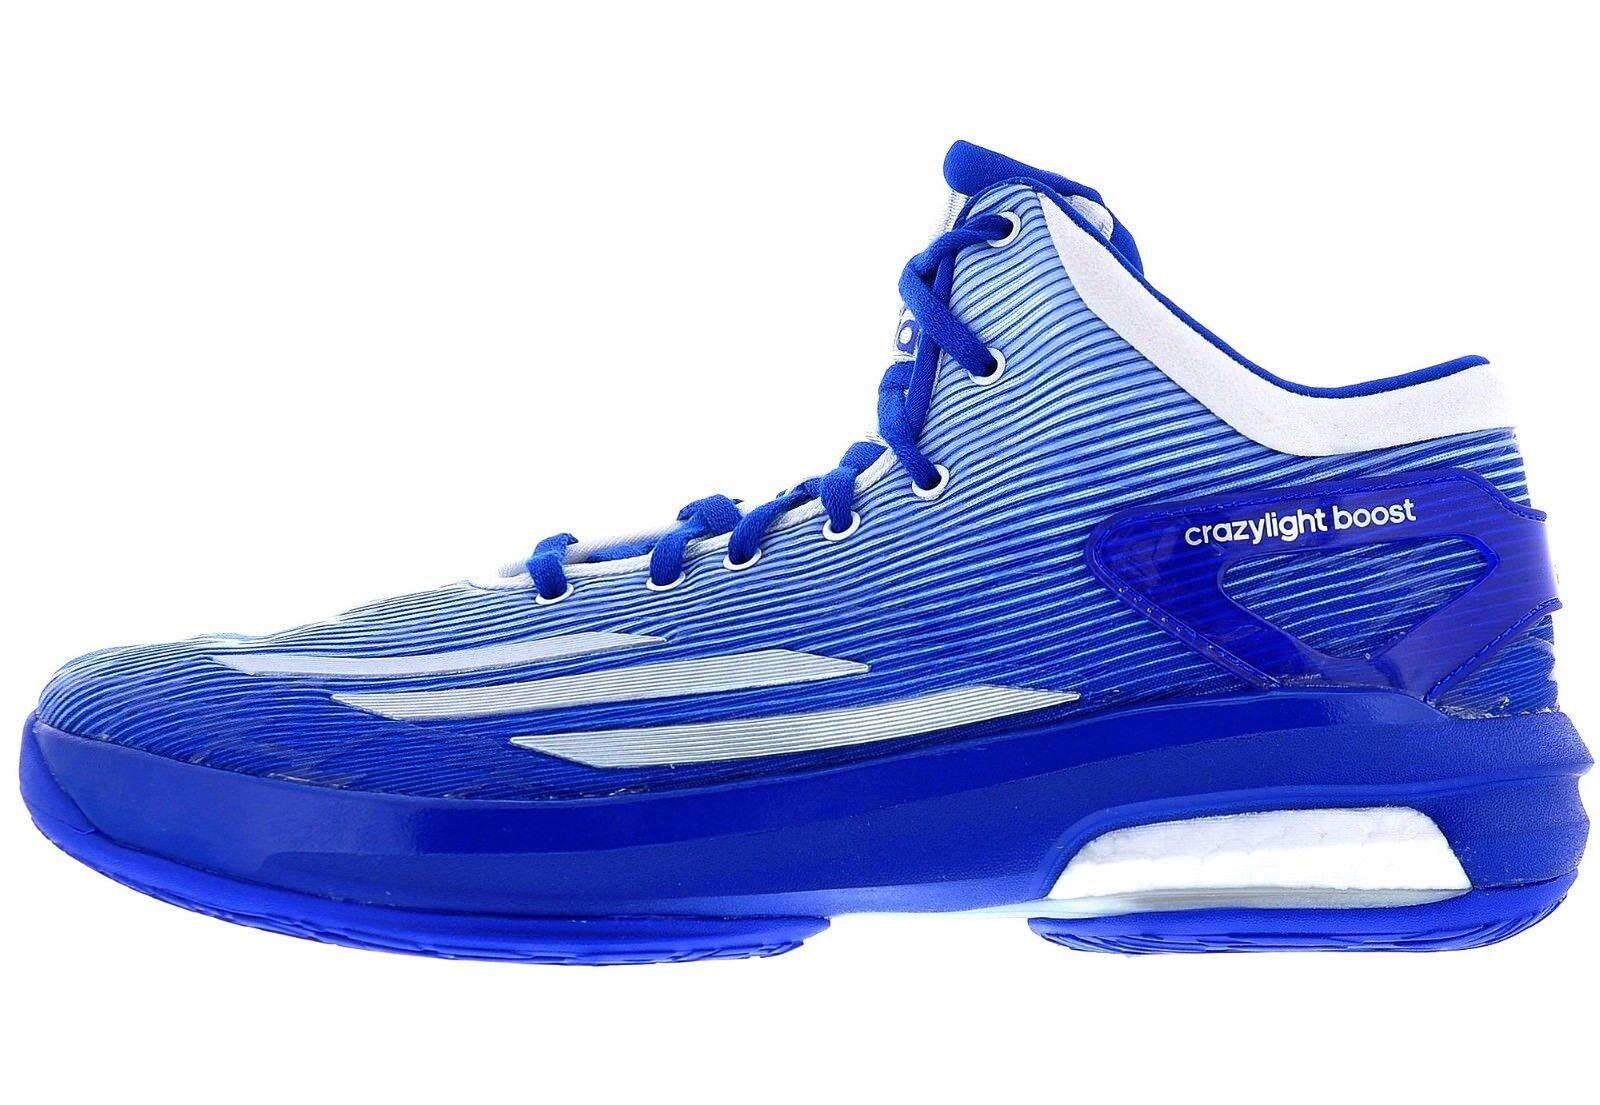 Adidas C77248 Performance Crazylight Boost Basketball Schuhe 53 1 3 UK17 Blau